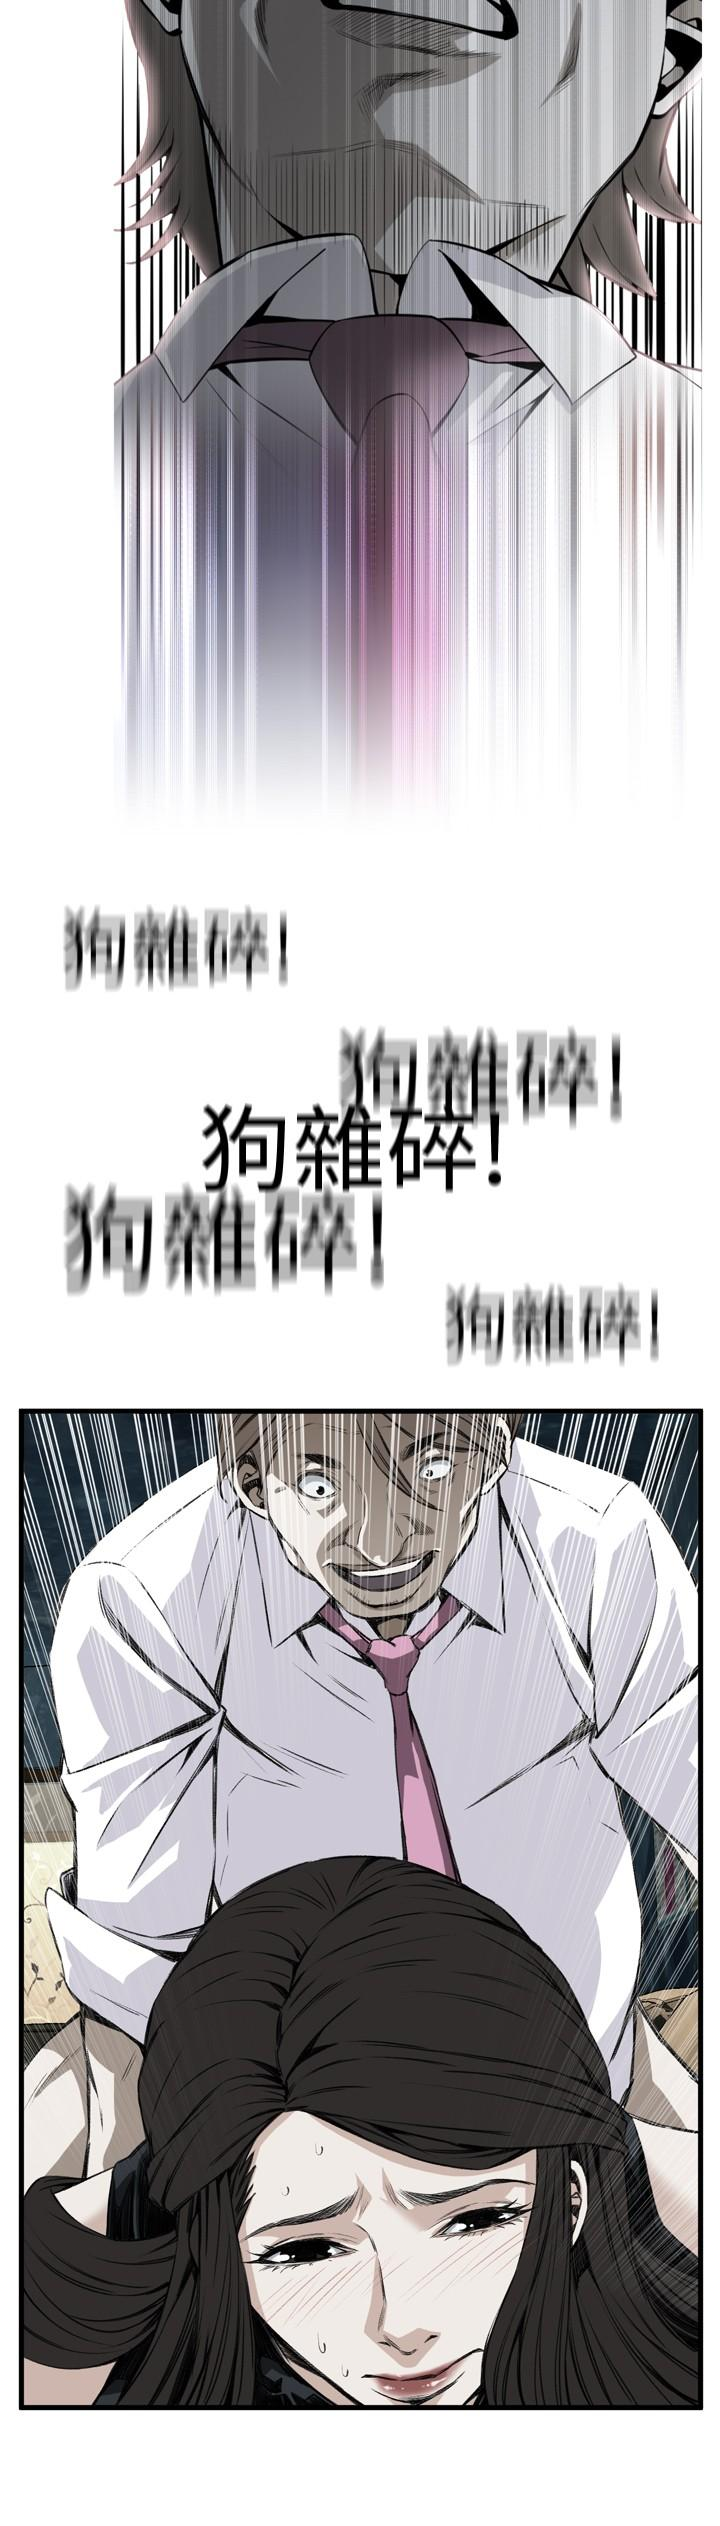 Take a Peek 偷窥 Ch.39~51 [Chinese]中文 189